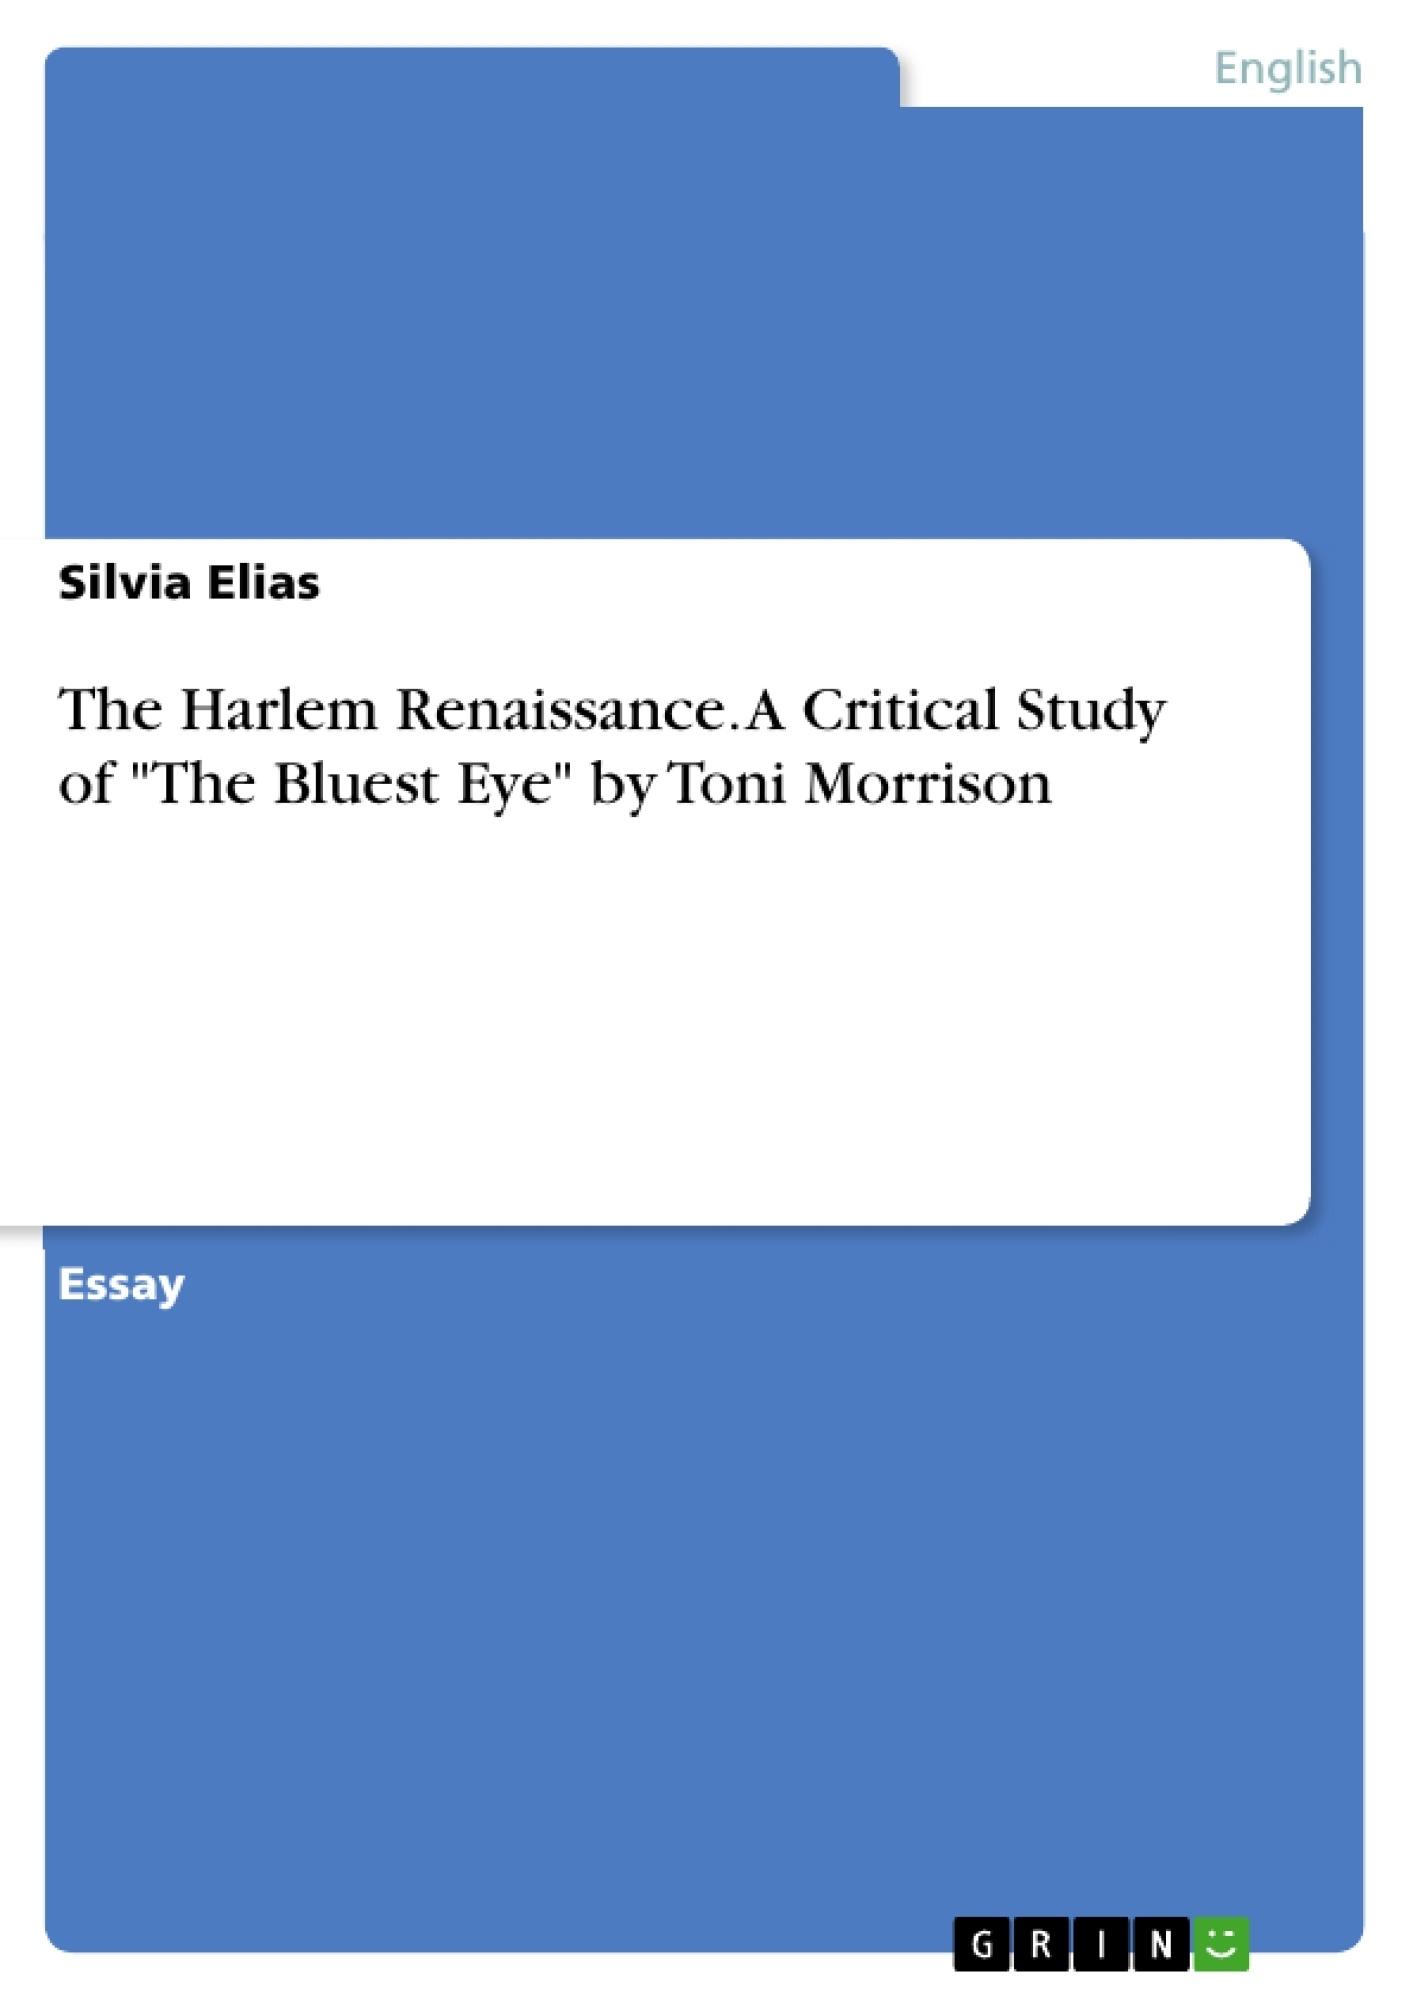 The Bluest Eye Analysis